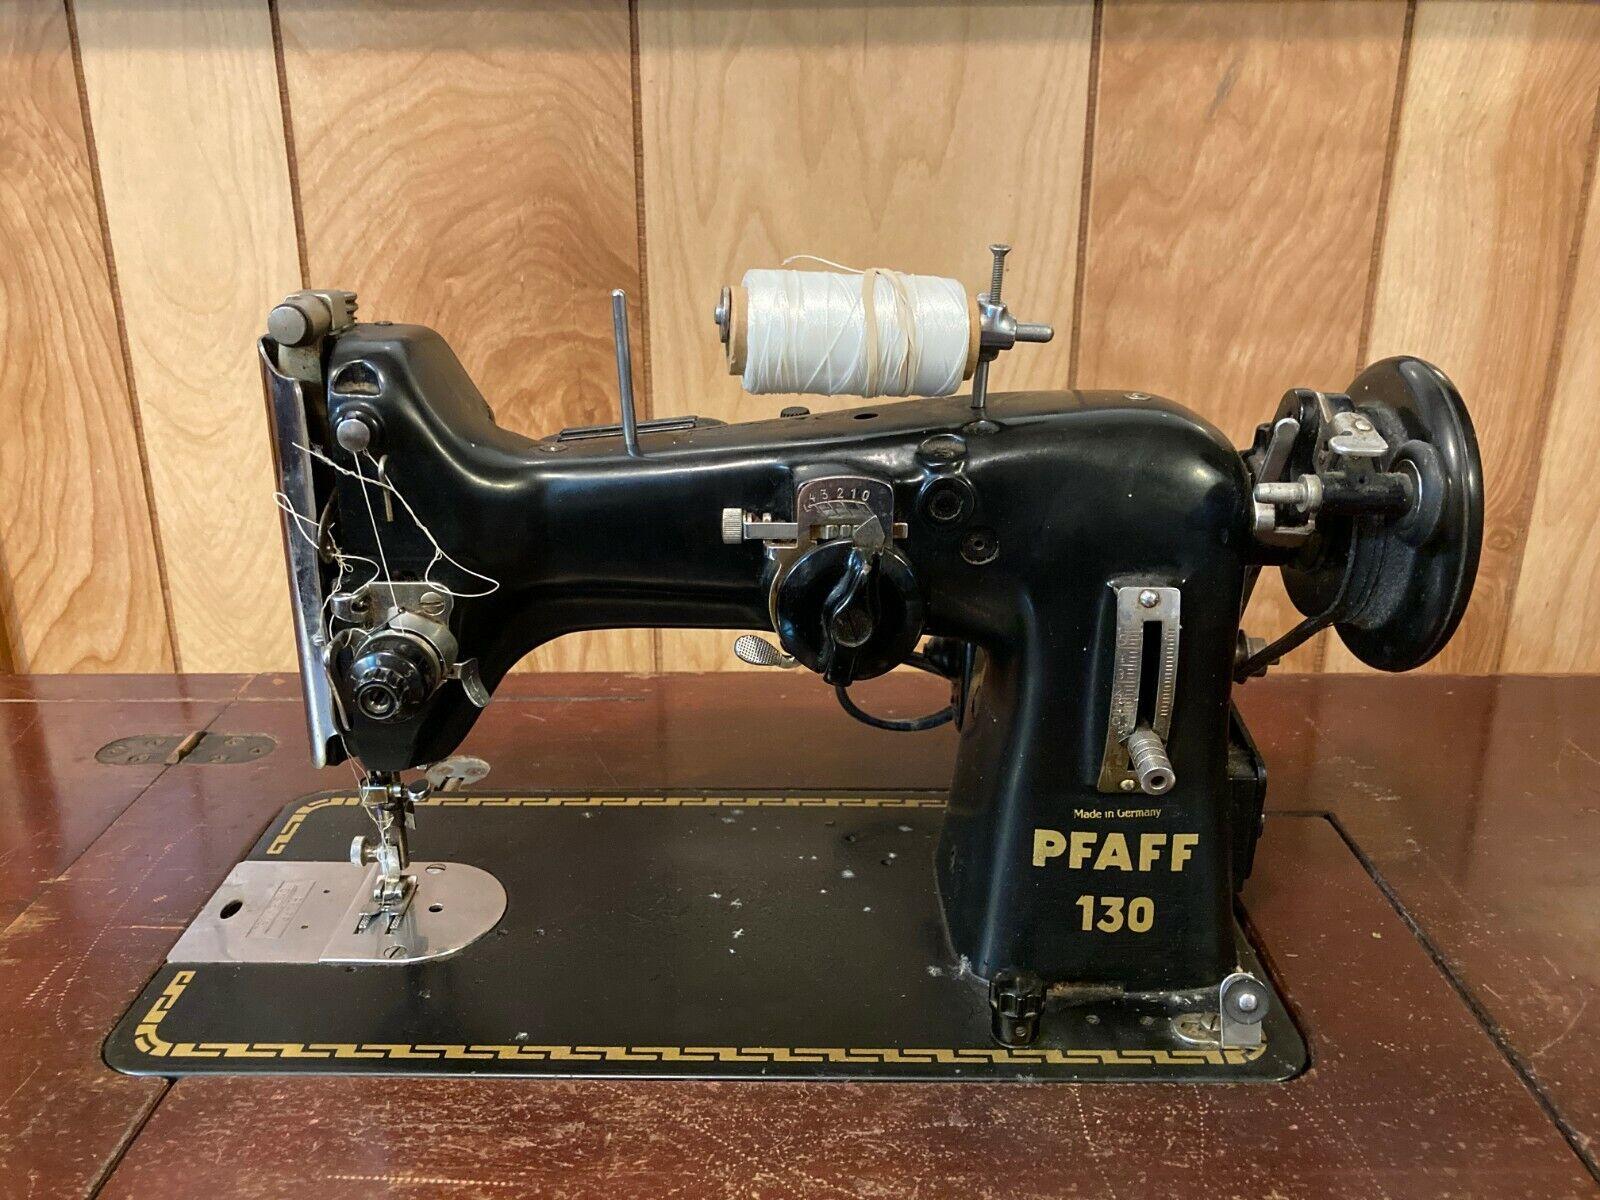 Retro vintage Home Decor Pfaff Model 130-6 semi-Industrial Zig Zag Vintage Sewing Machine Vintage Fashion Textiles Decorative  Antiques